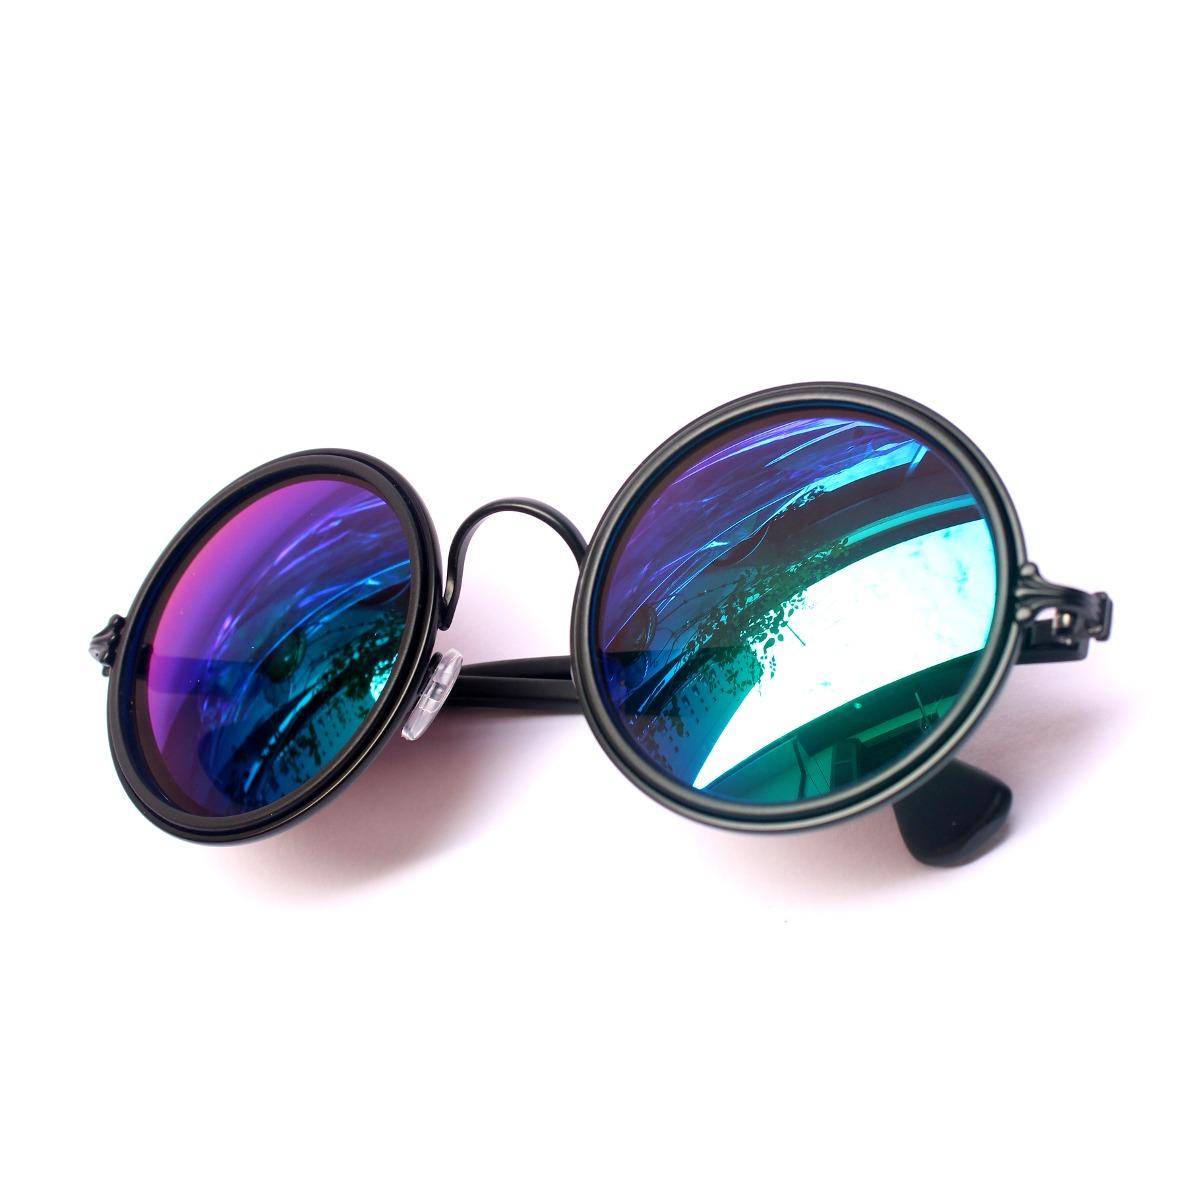 dd1b38d673cbf óculos sol retrô espelhado redondo hippie + brinde grátis¤. Carregando zoom.